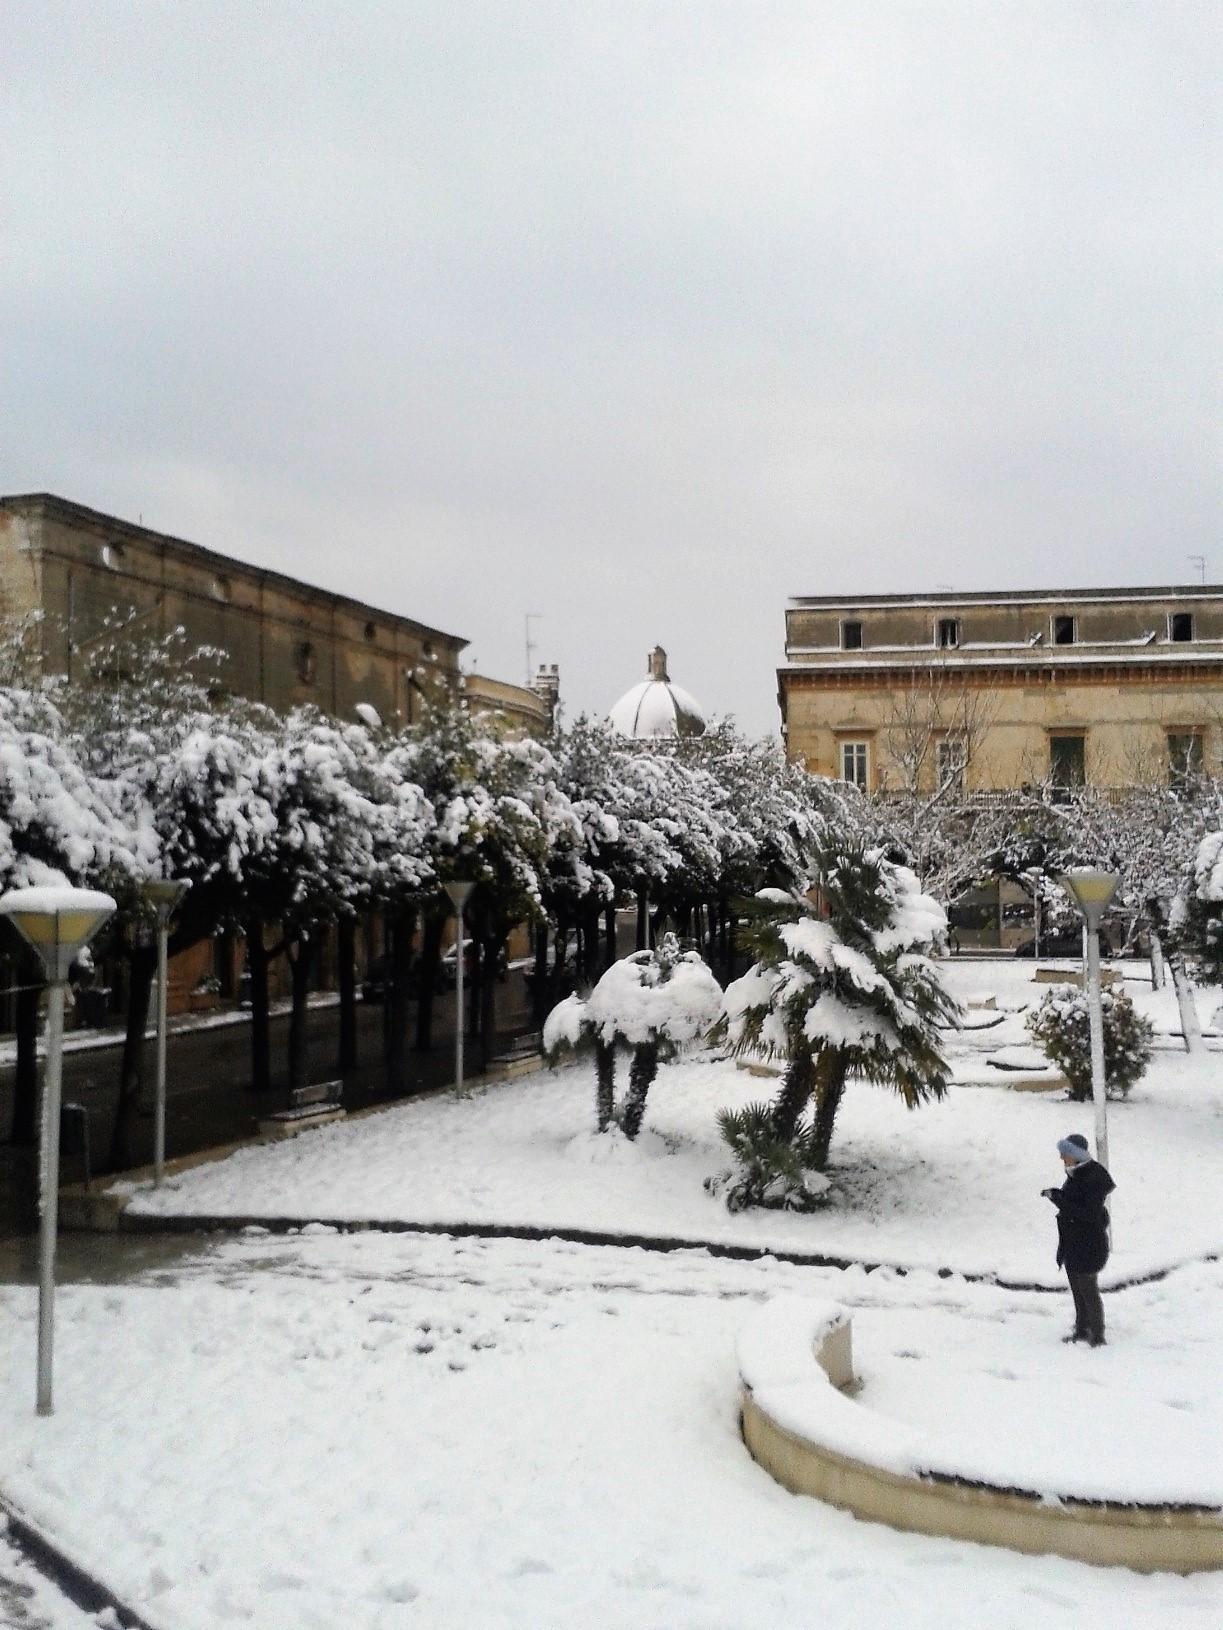 Galleria fotografica neve 03-04 gennaio 2019-wp_000350.jpg